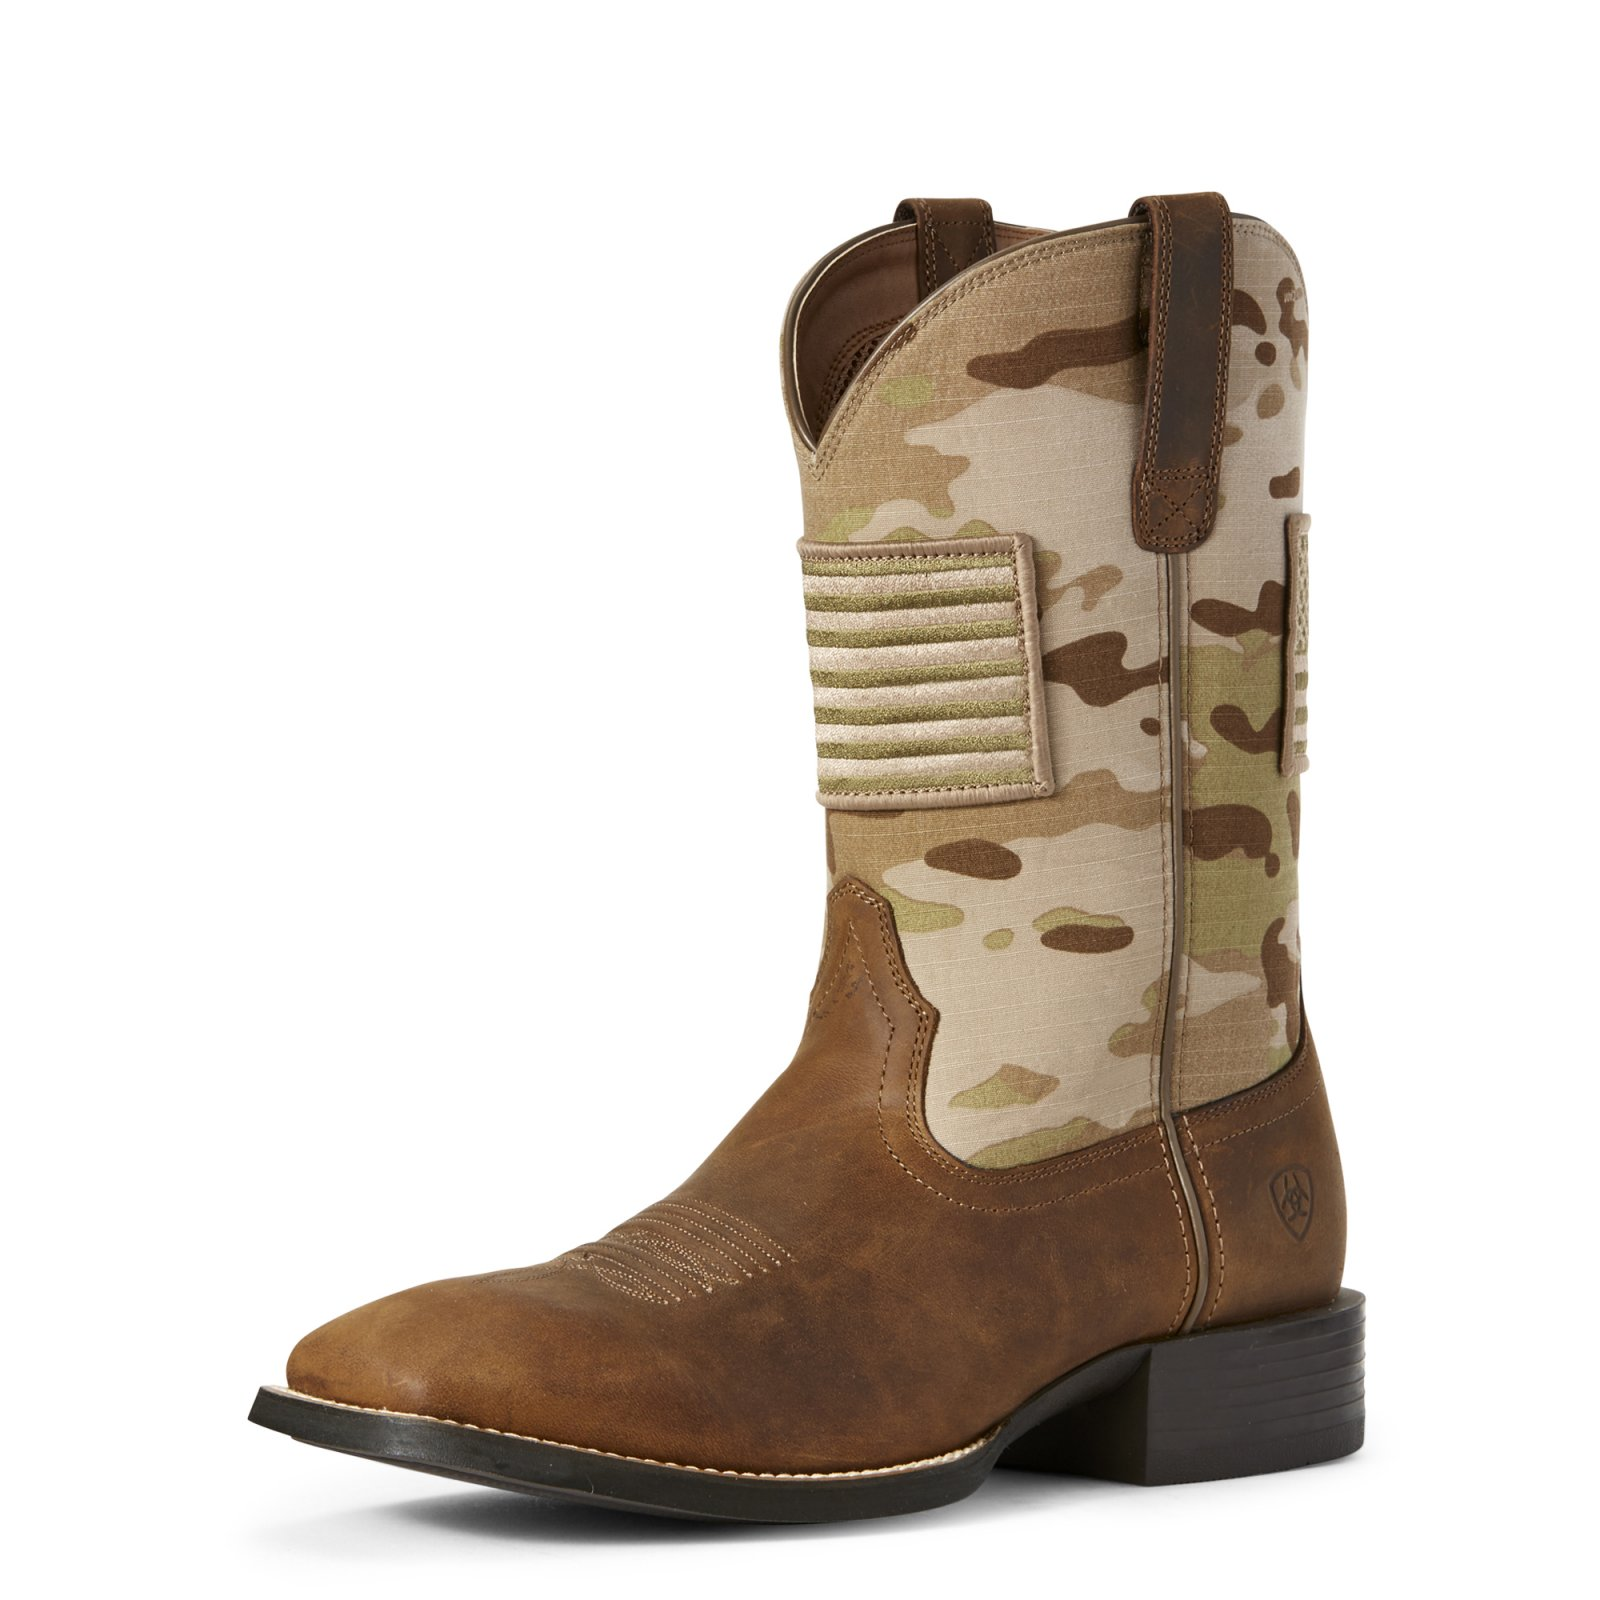 Men's Sport Patriot Boot from Ariat